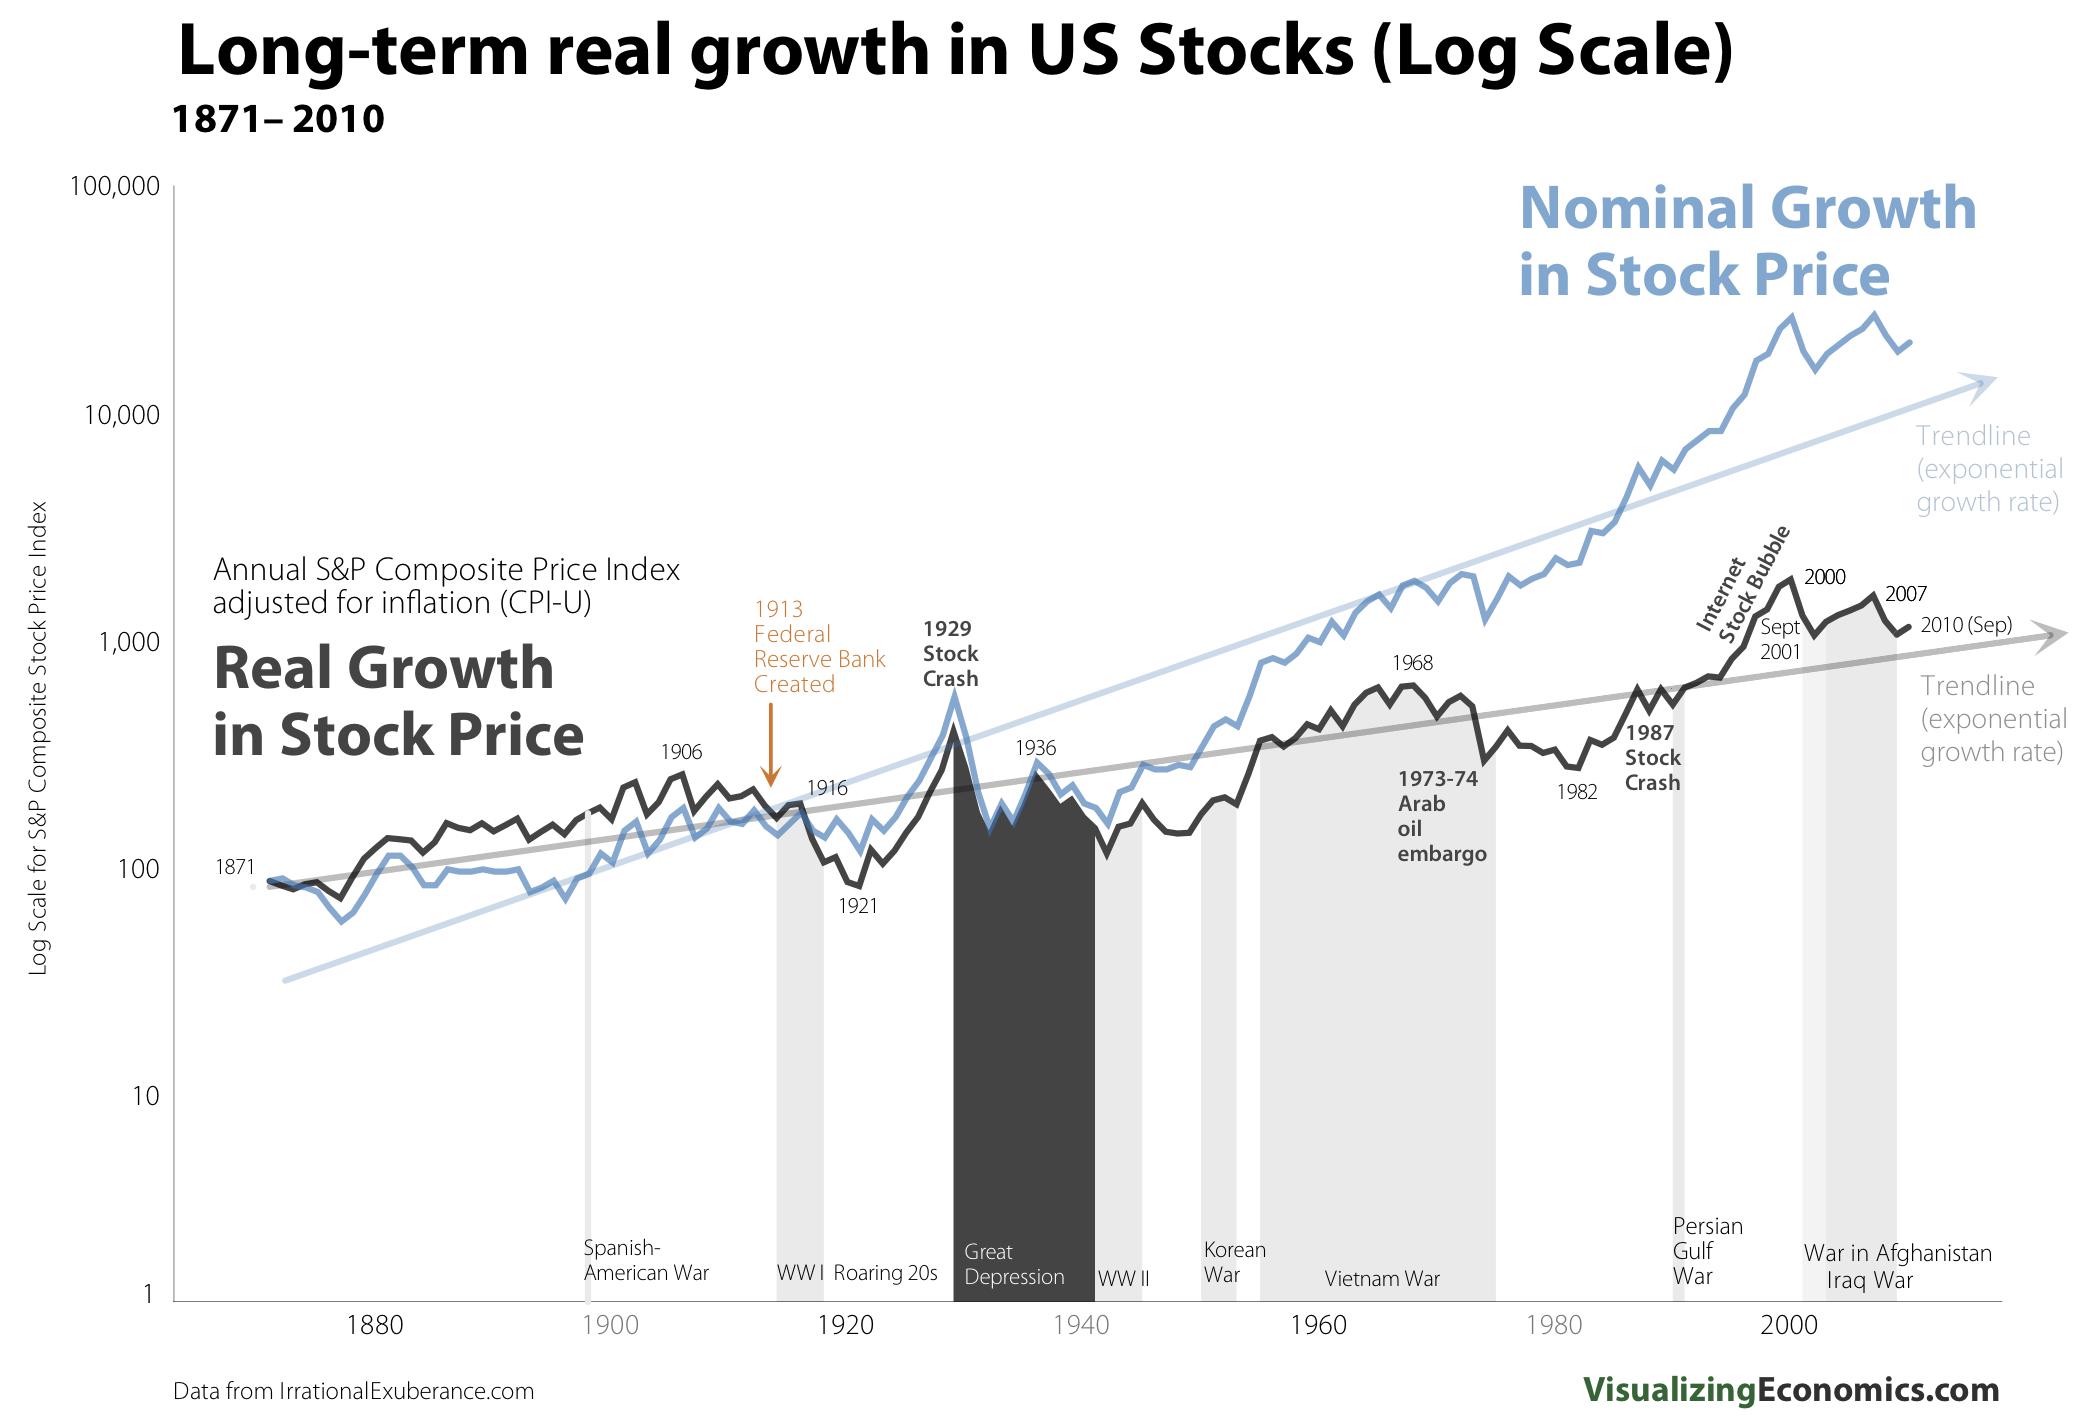 RealNominal_Stock_Growth_Log1.png